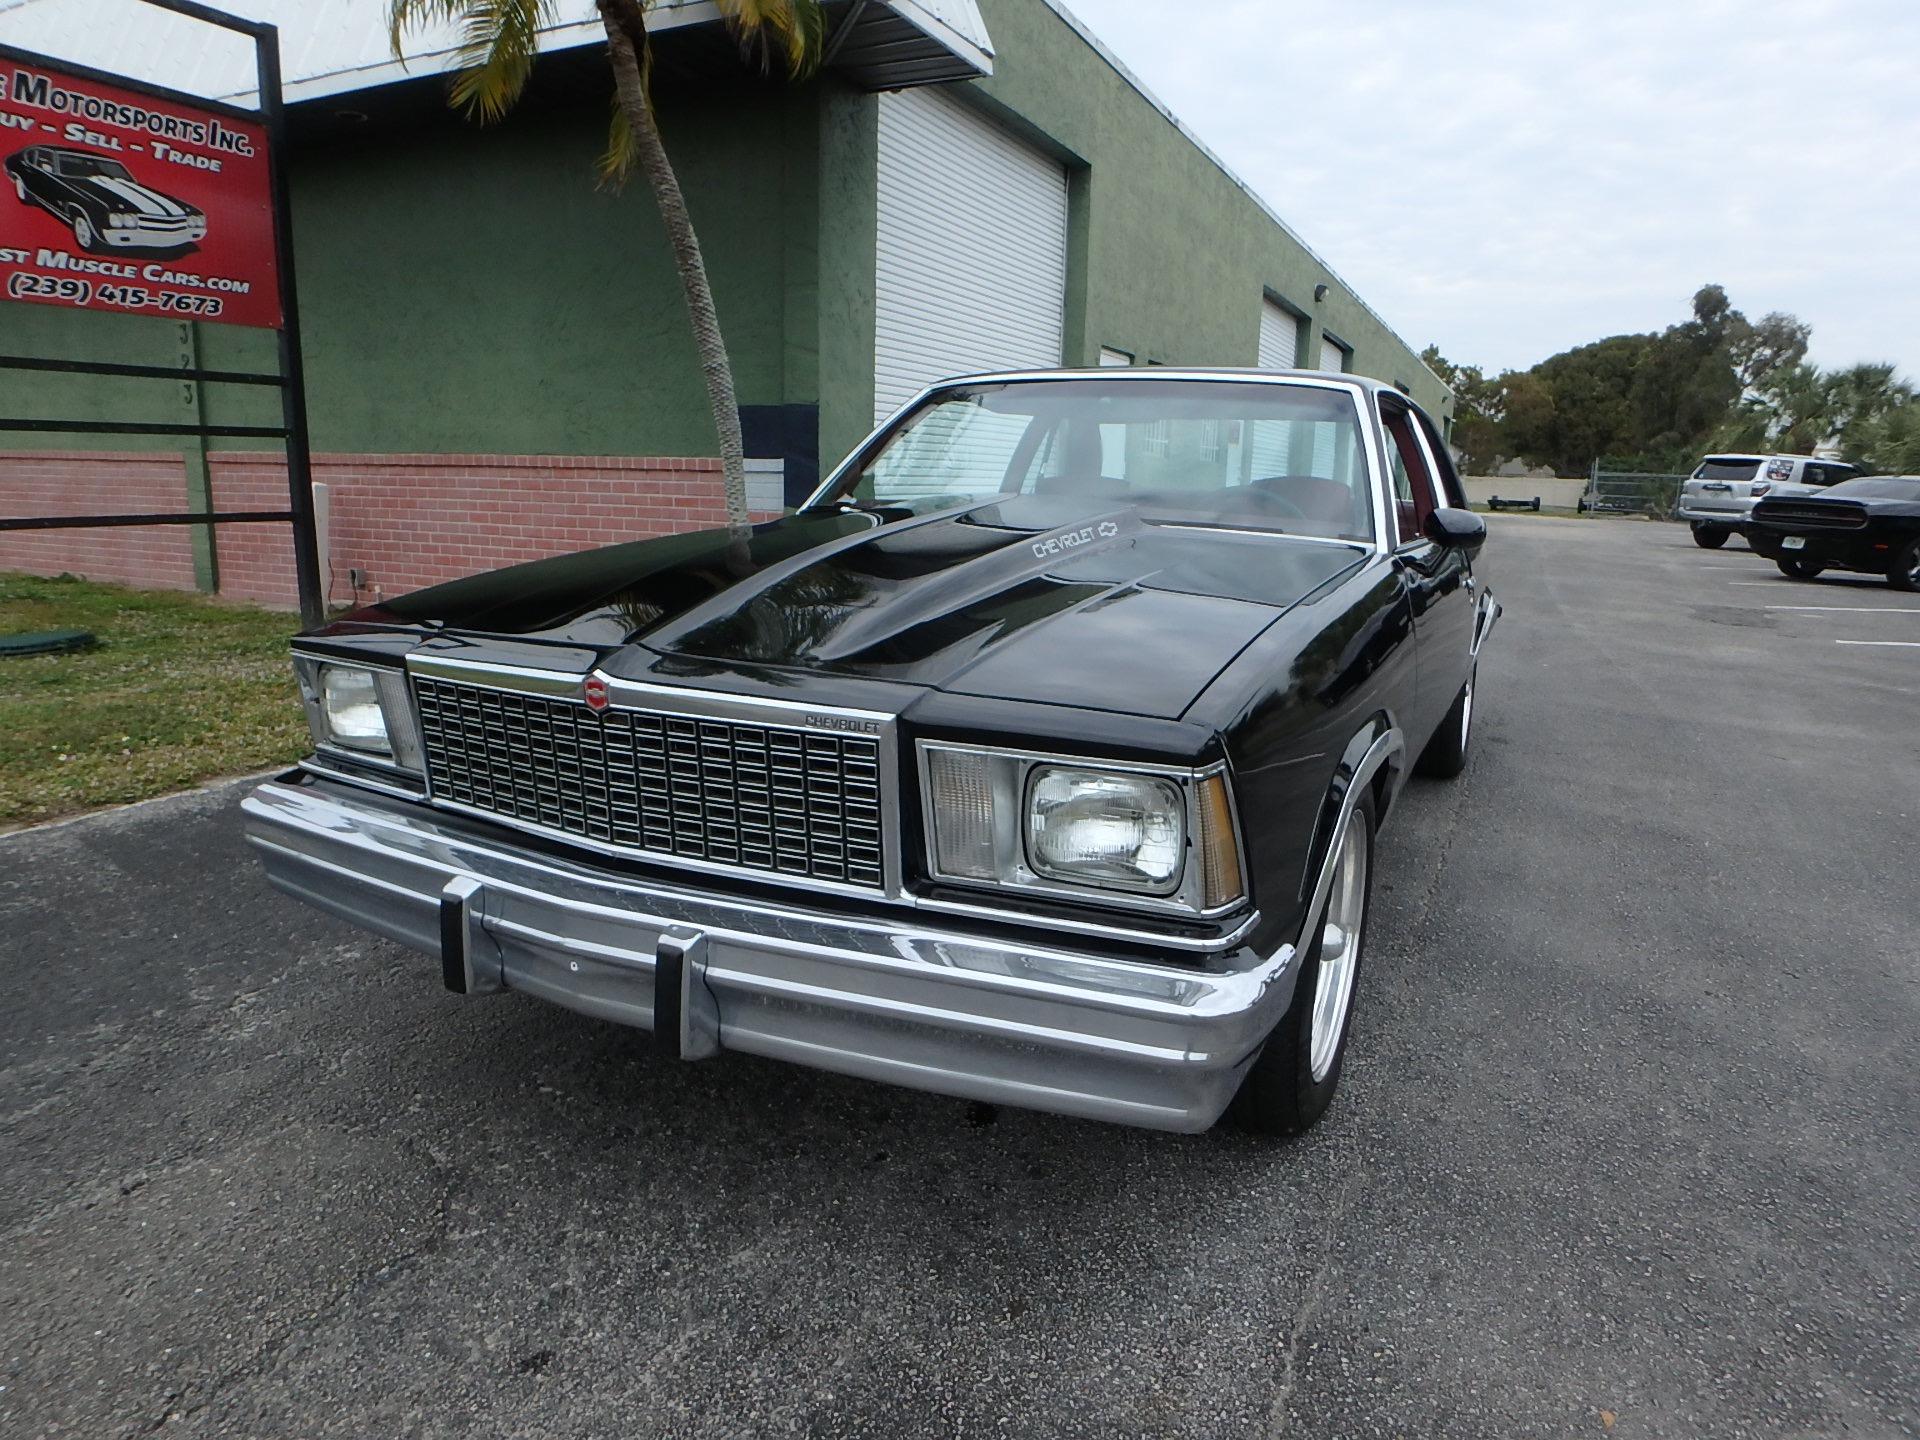 Used 1979 Chevy Malibu